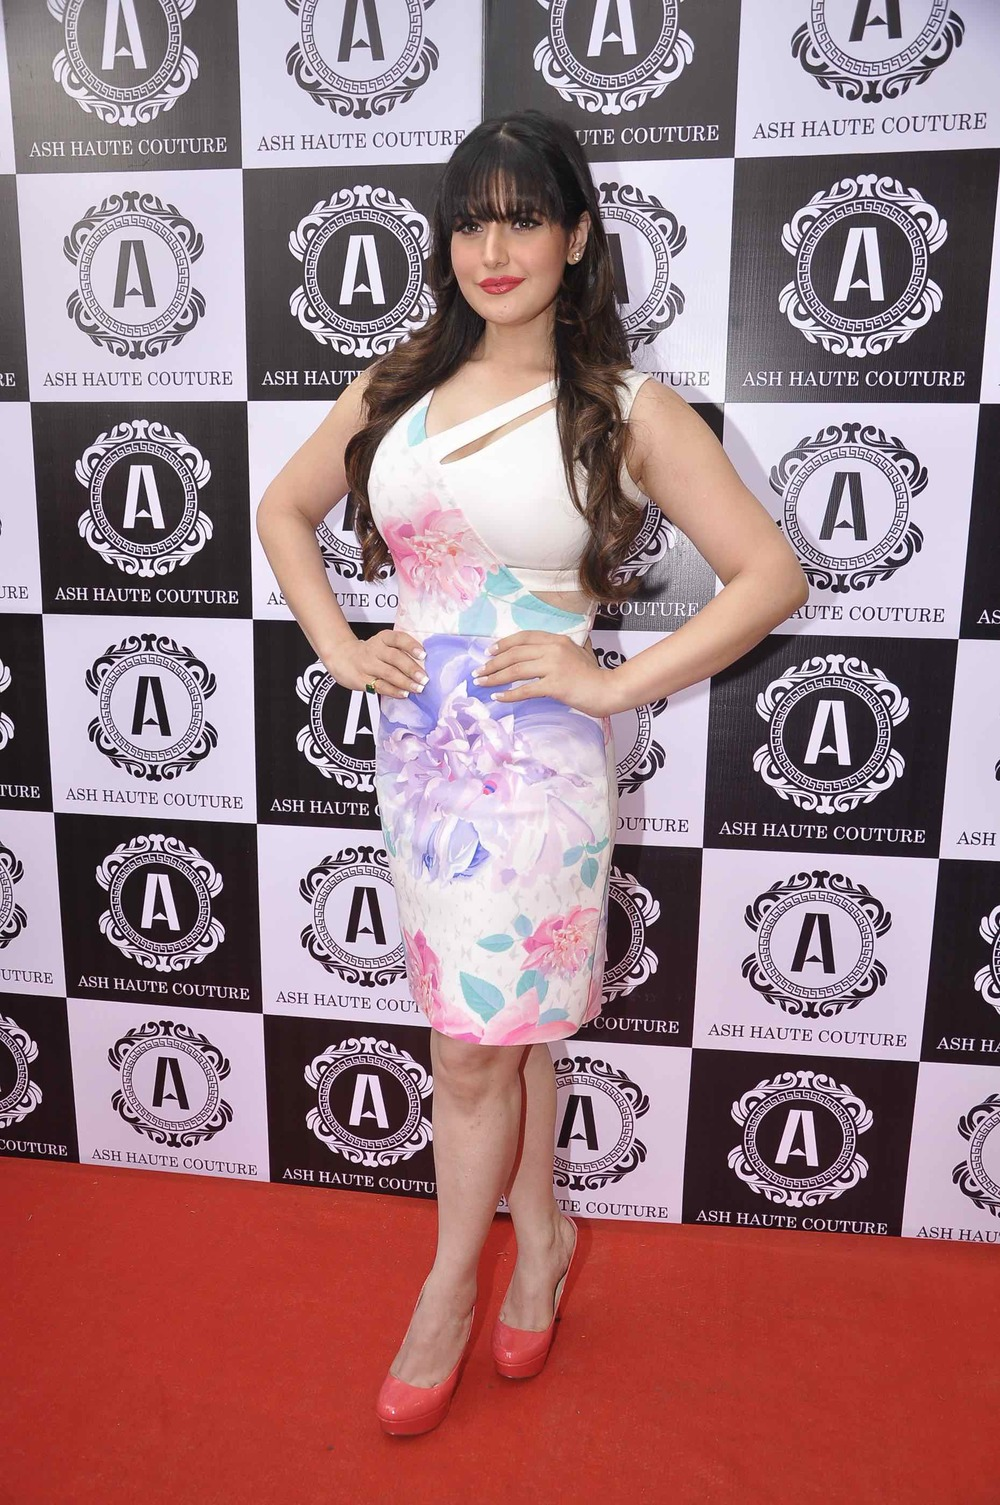 Zarine Khan in Ashna Gupta Ash Haute couture